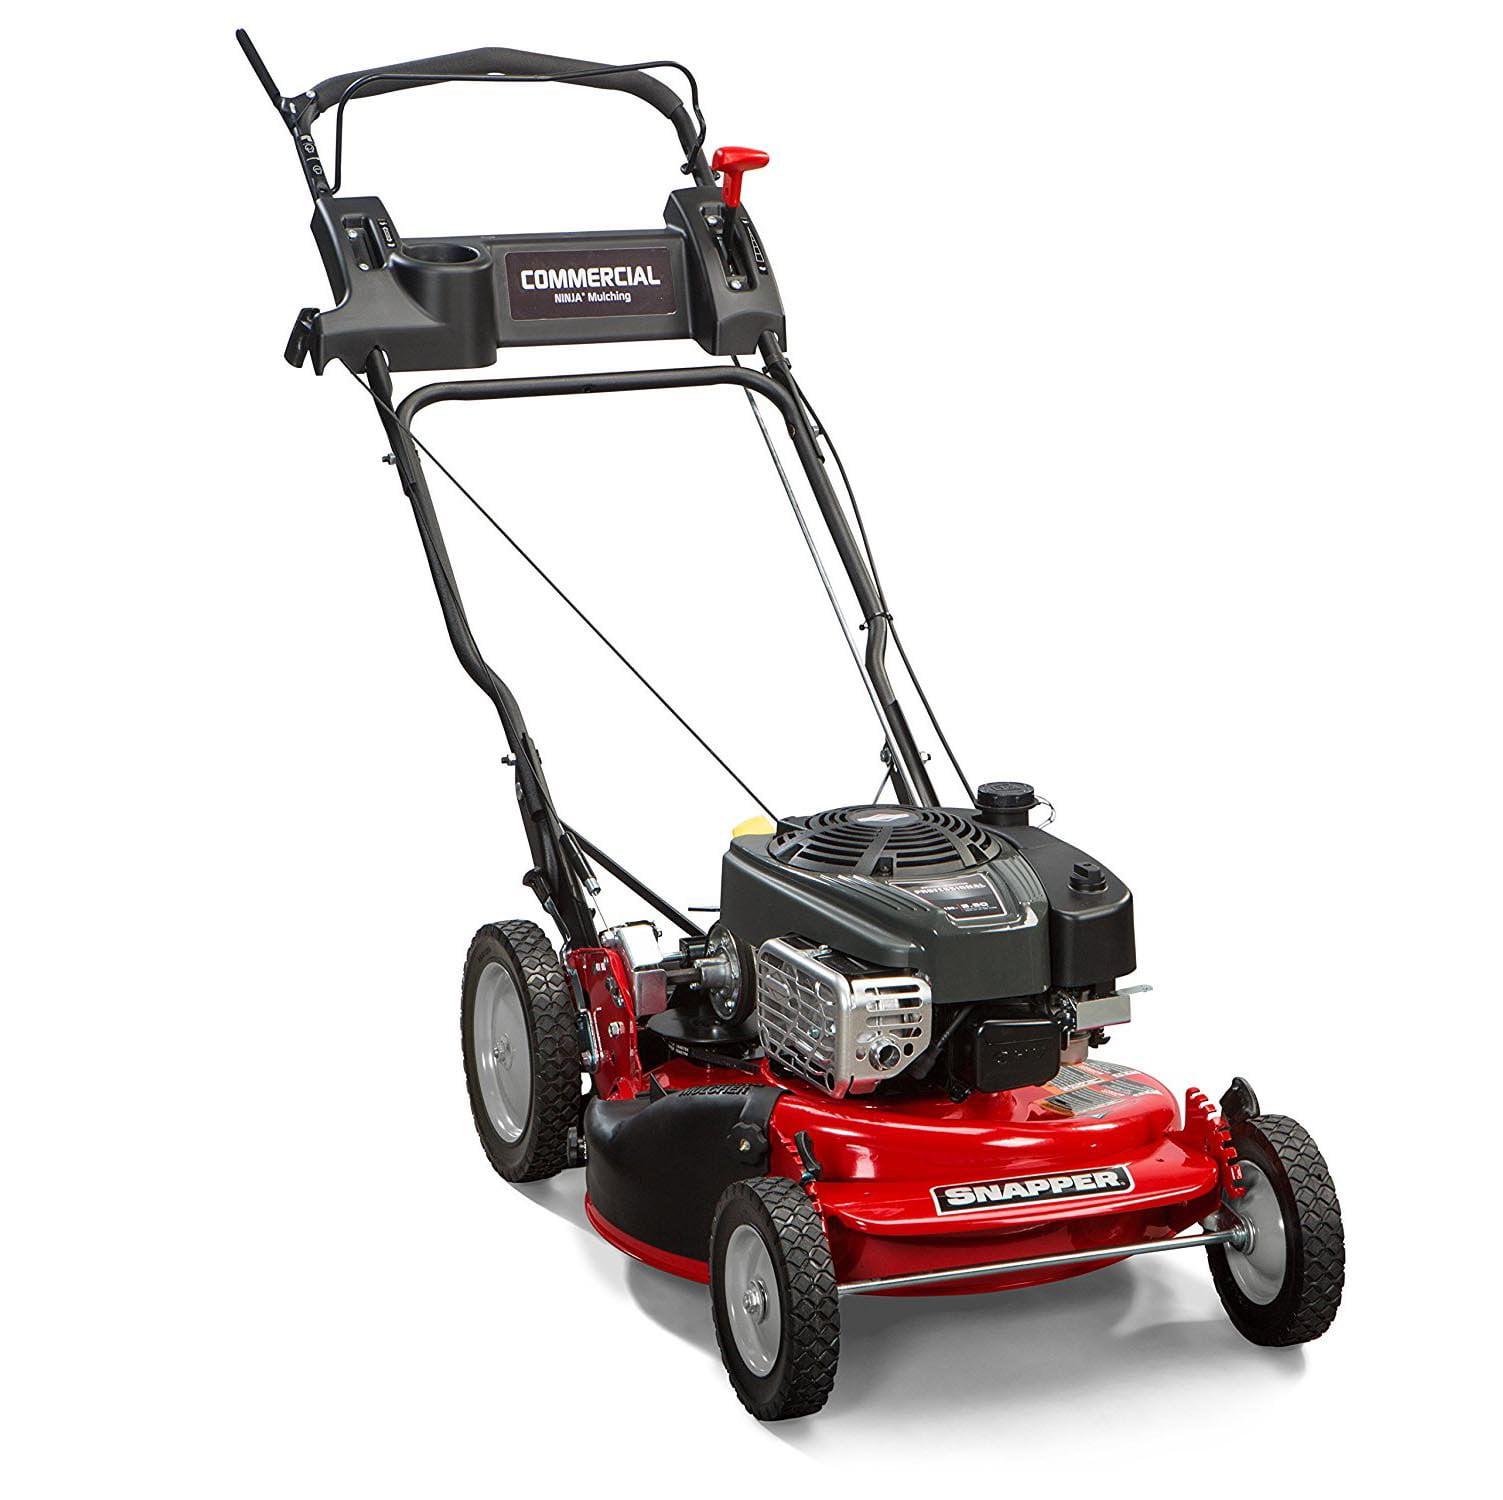 "Snapper 7800968 Commercial Series HI VAC 21"" Self Propelled Mulching Lawn Mower"